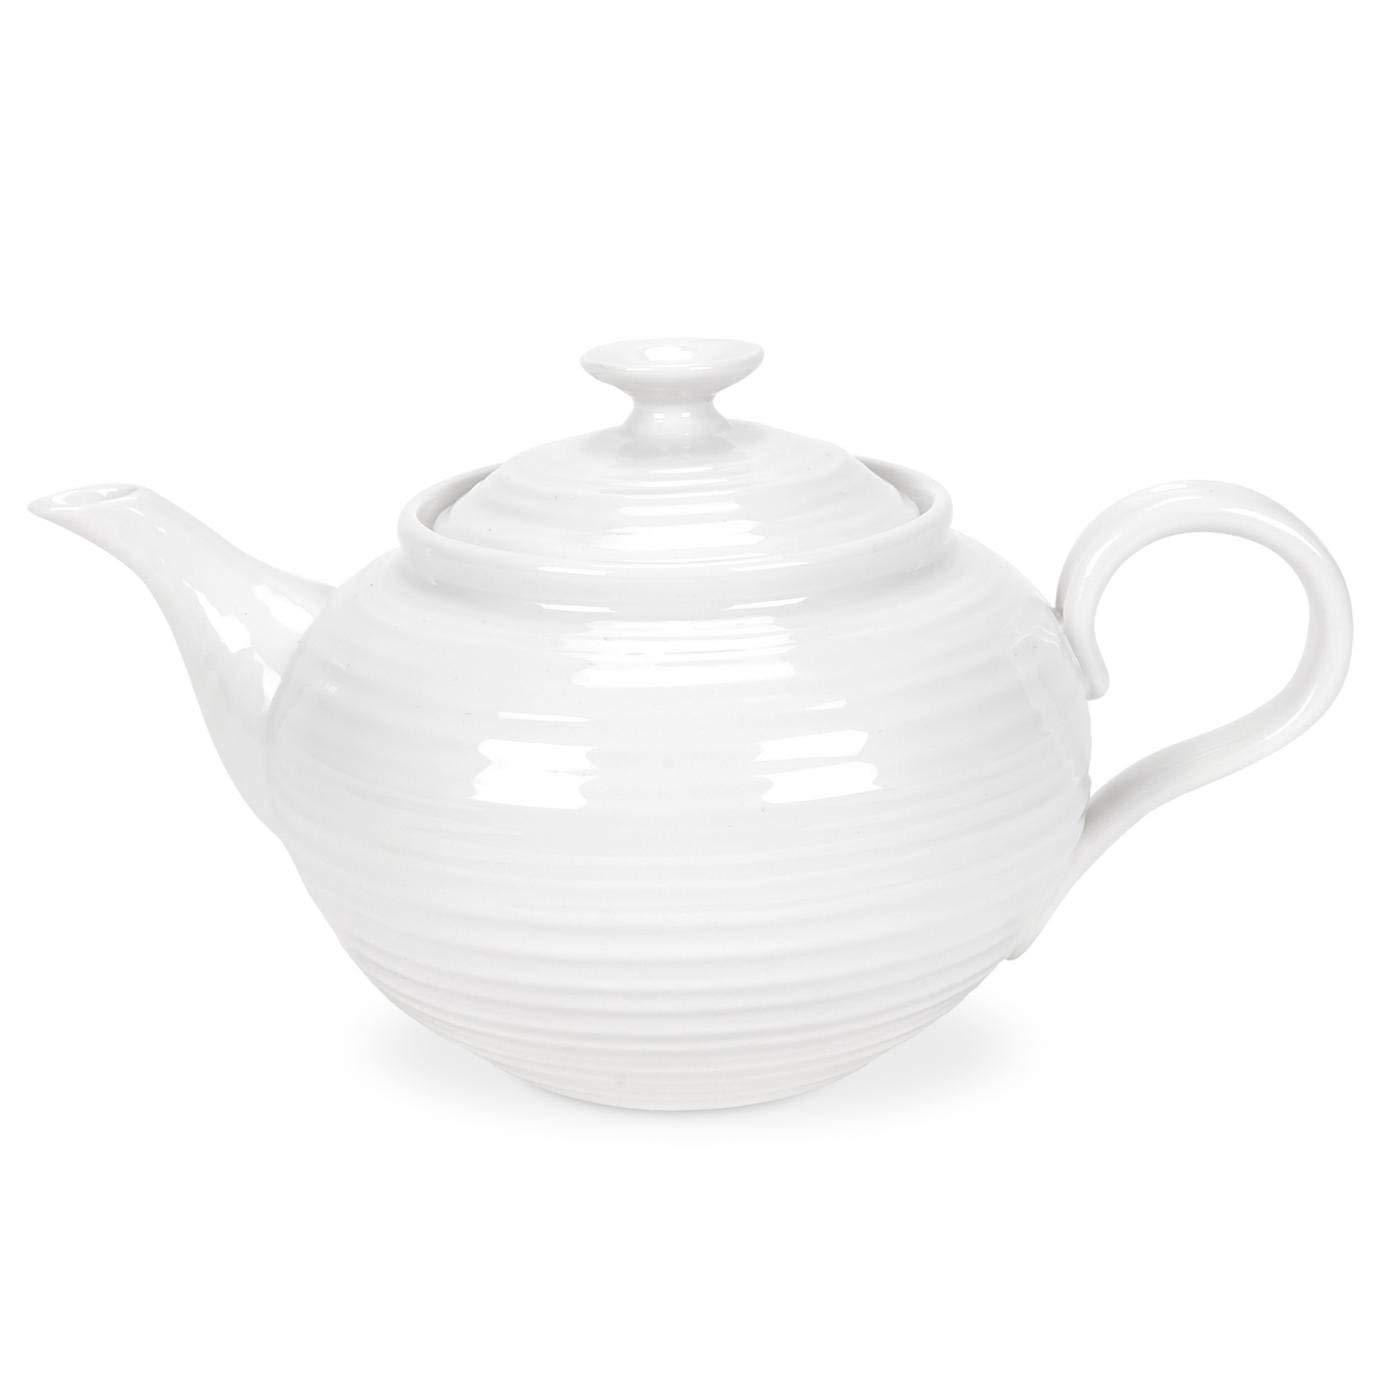 White Teapot 1.13 litres Sophie Conran for Portmeirion